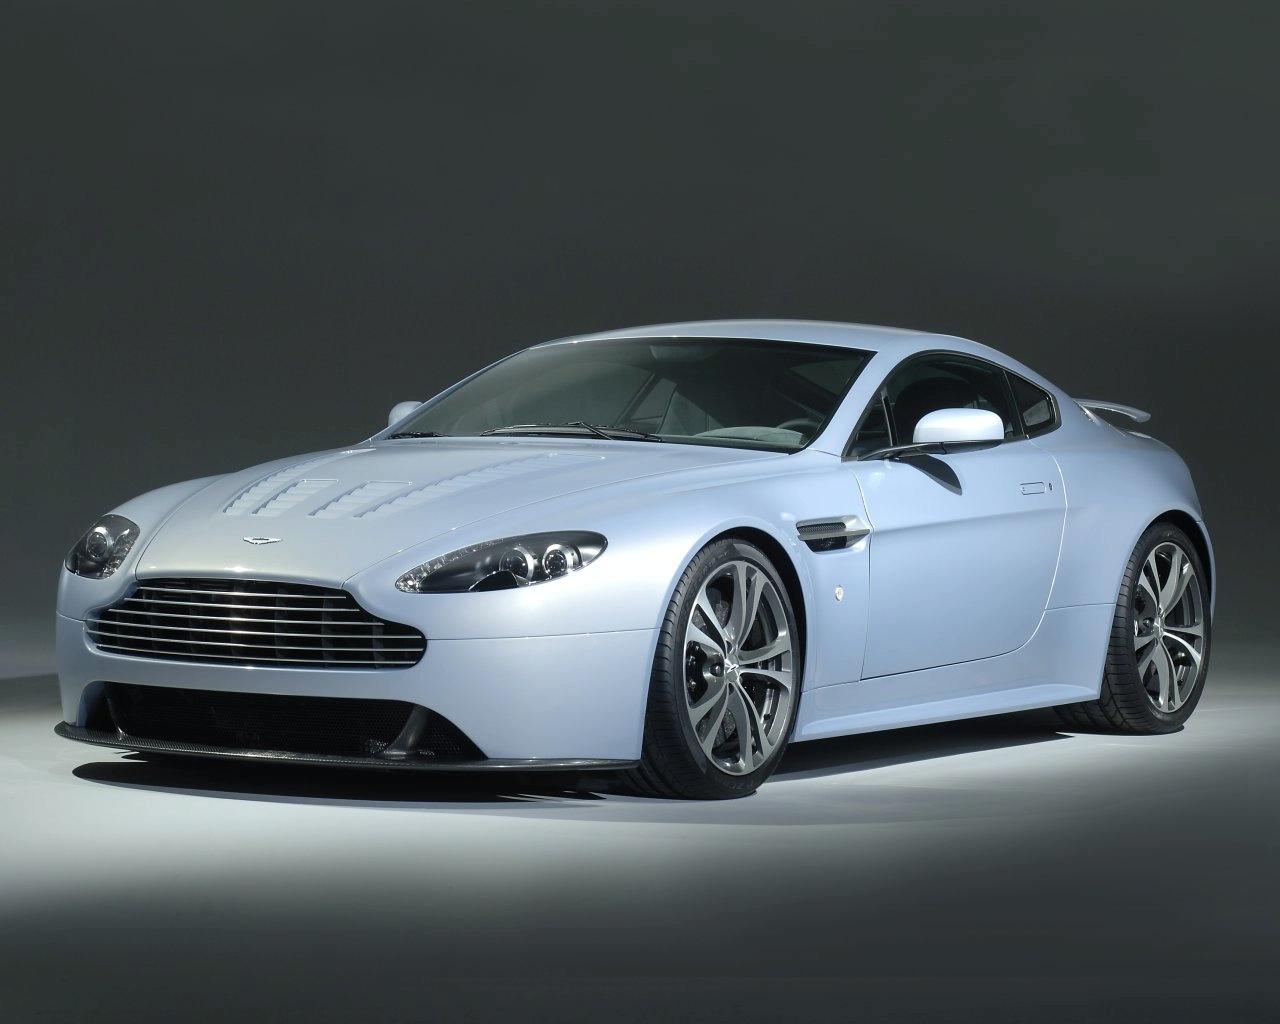 http://images.caradisiac.com/images/1/2/8/4/21284/S0-Aston-Martin-V12-Vantage-RS-Concept-la-future-bombe-anglaise-est-officielle-91400.jpg